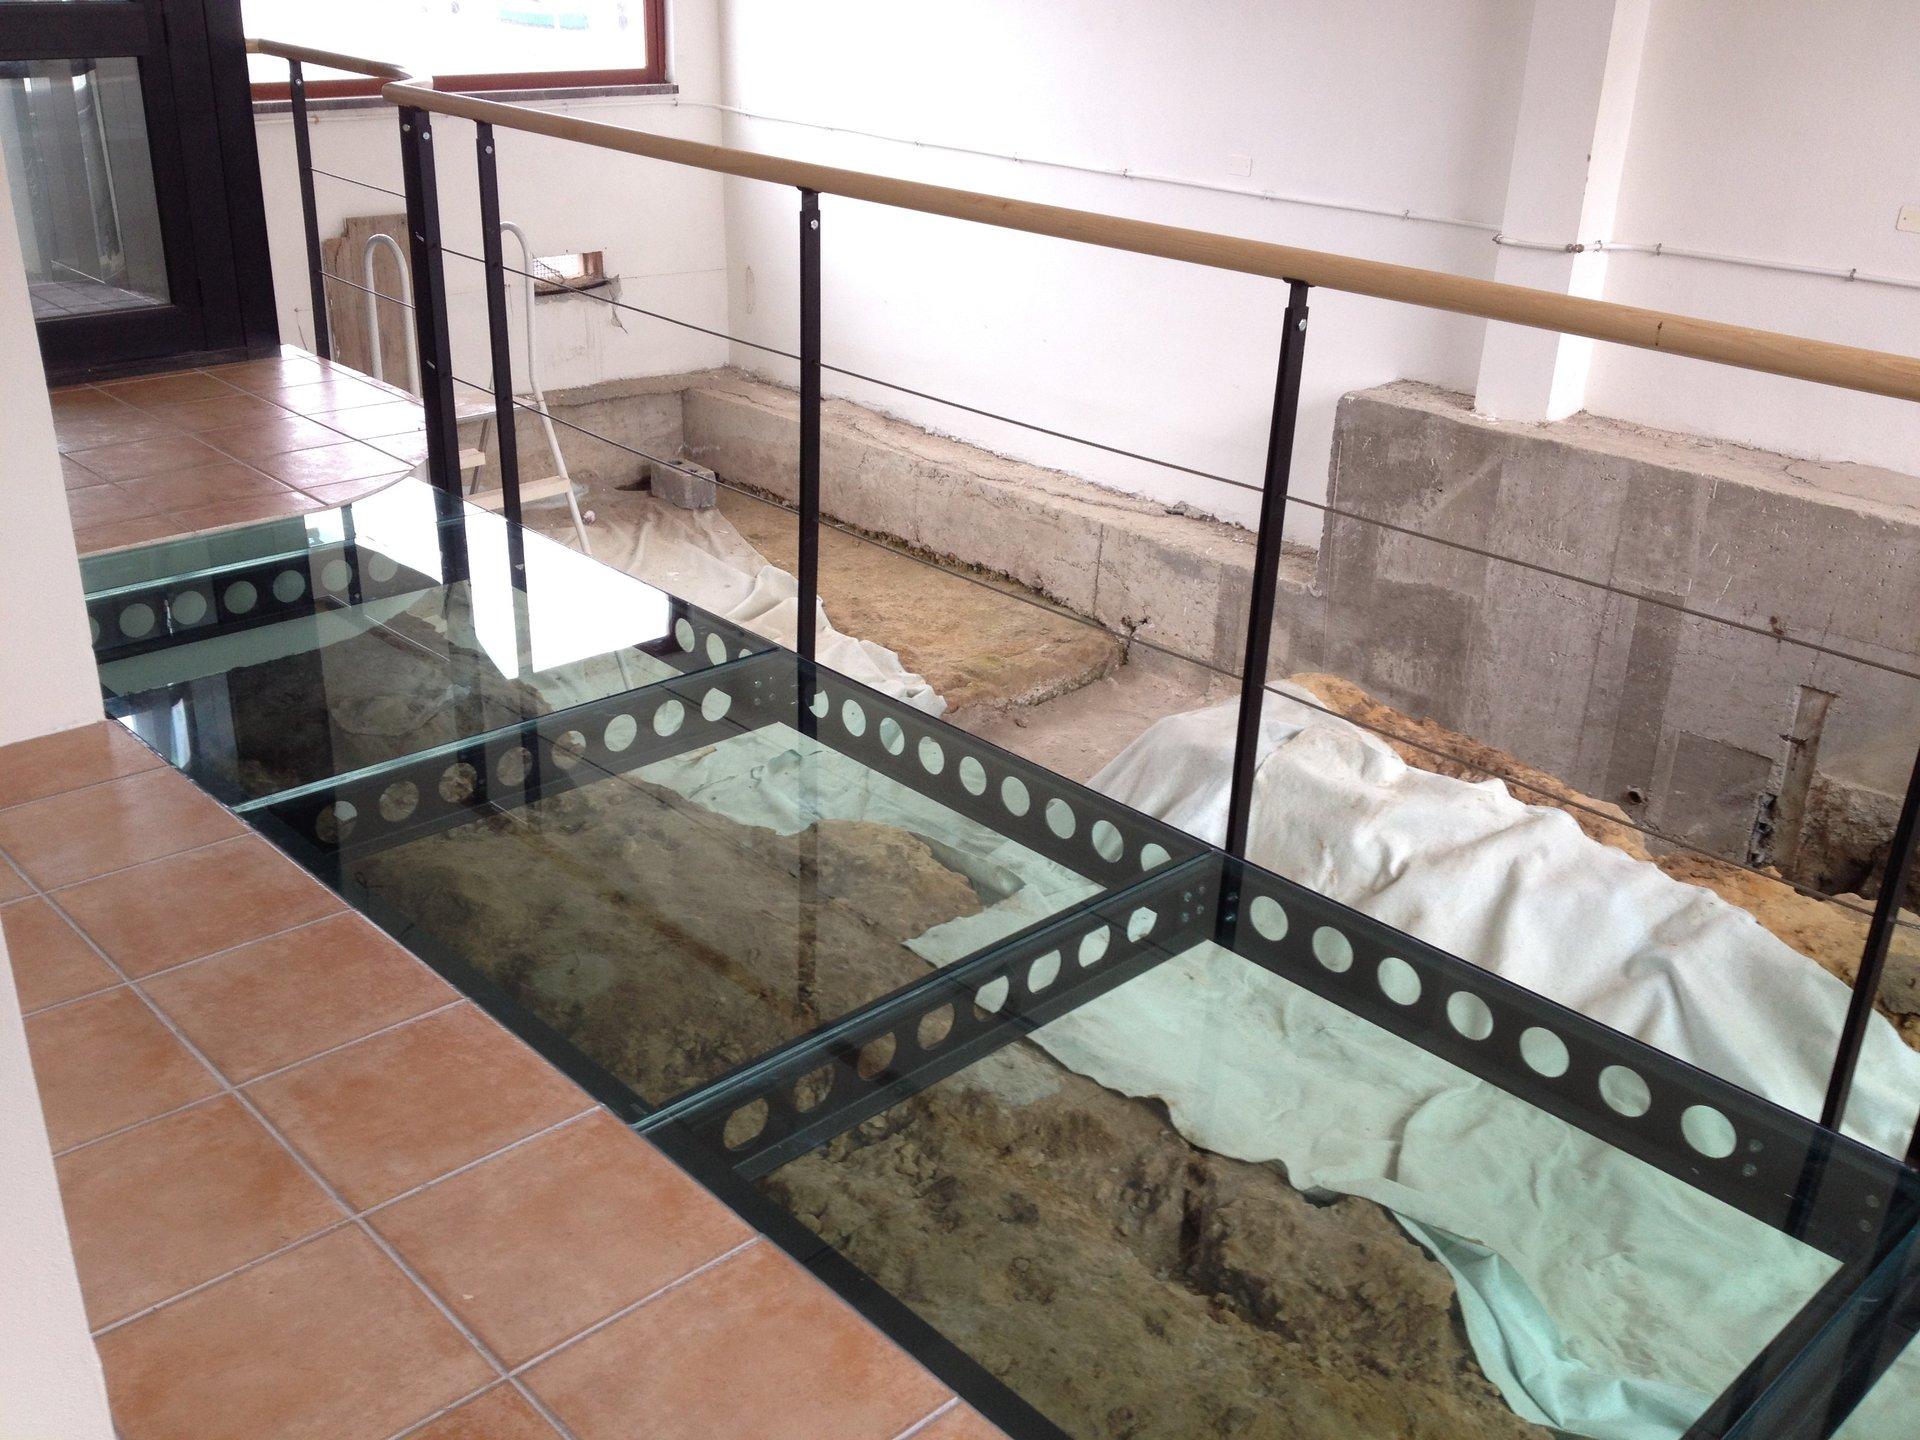 tavoli in vetro, oggetti in vetro, complementi in vetro